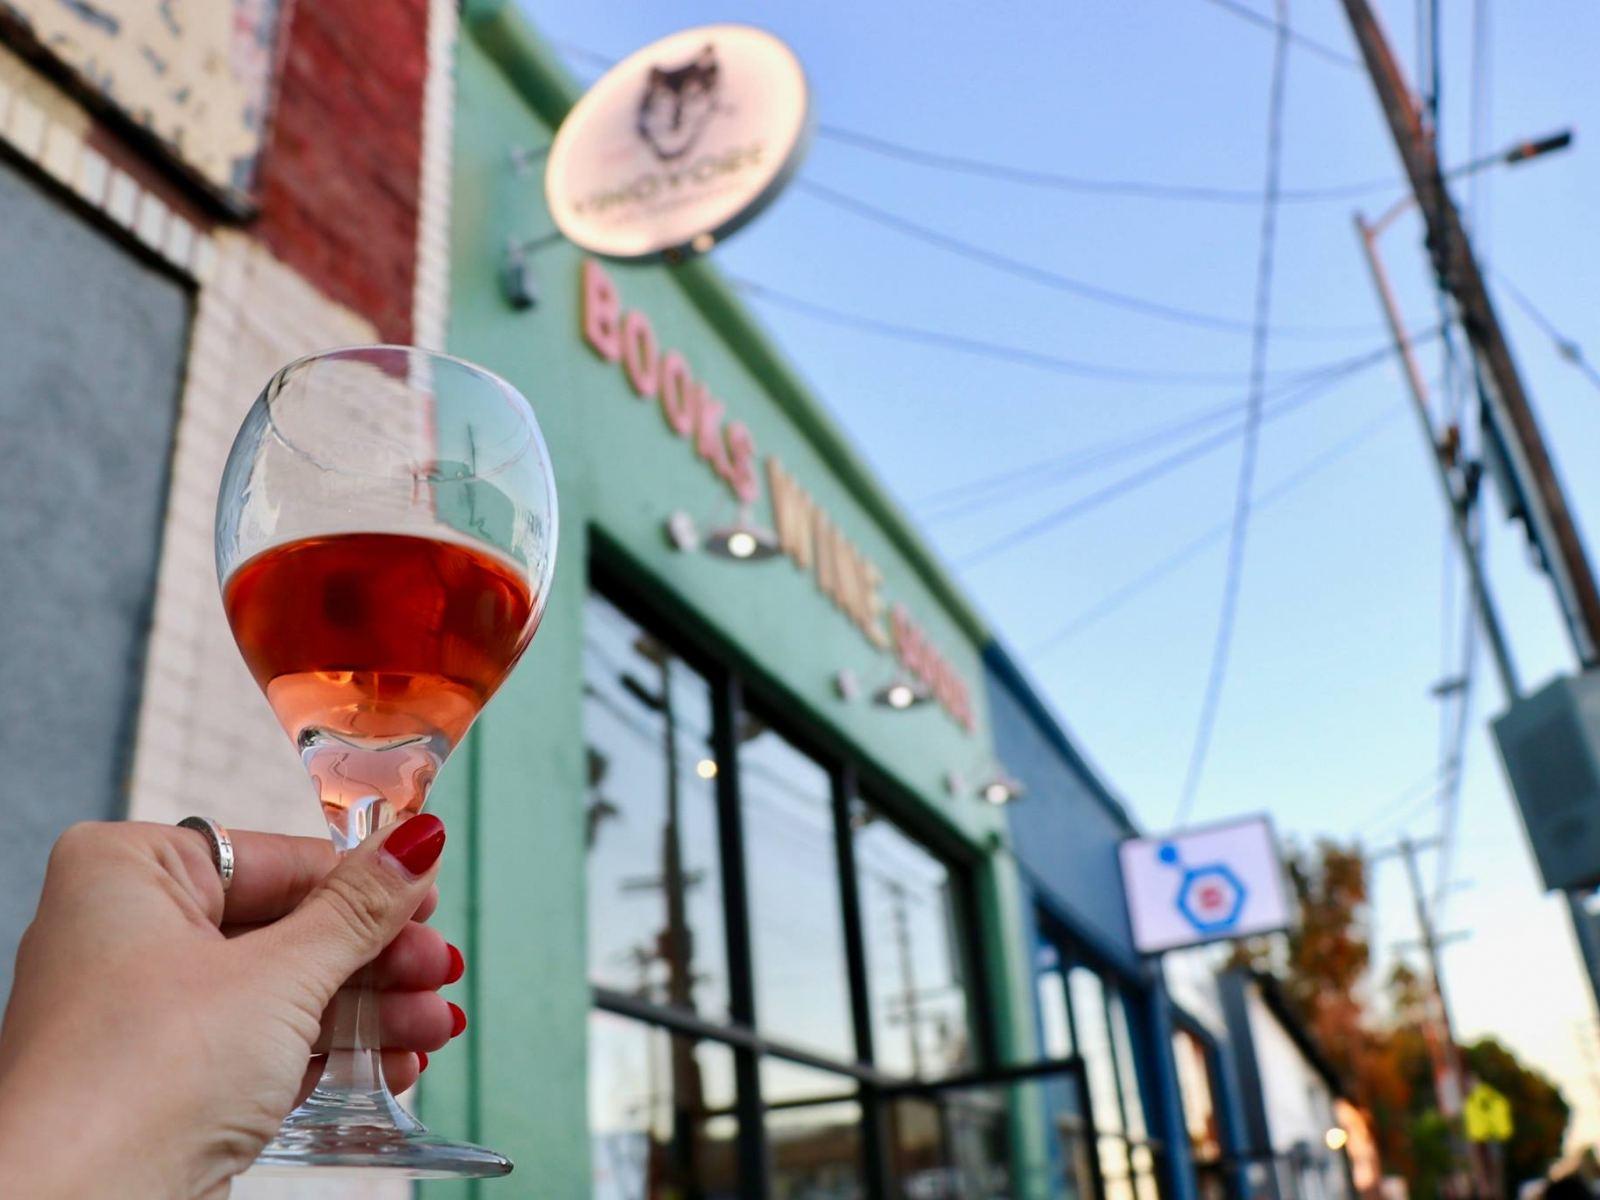 Vinovore Wine Store